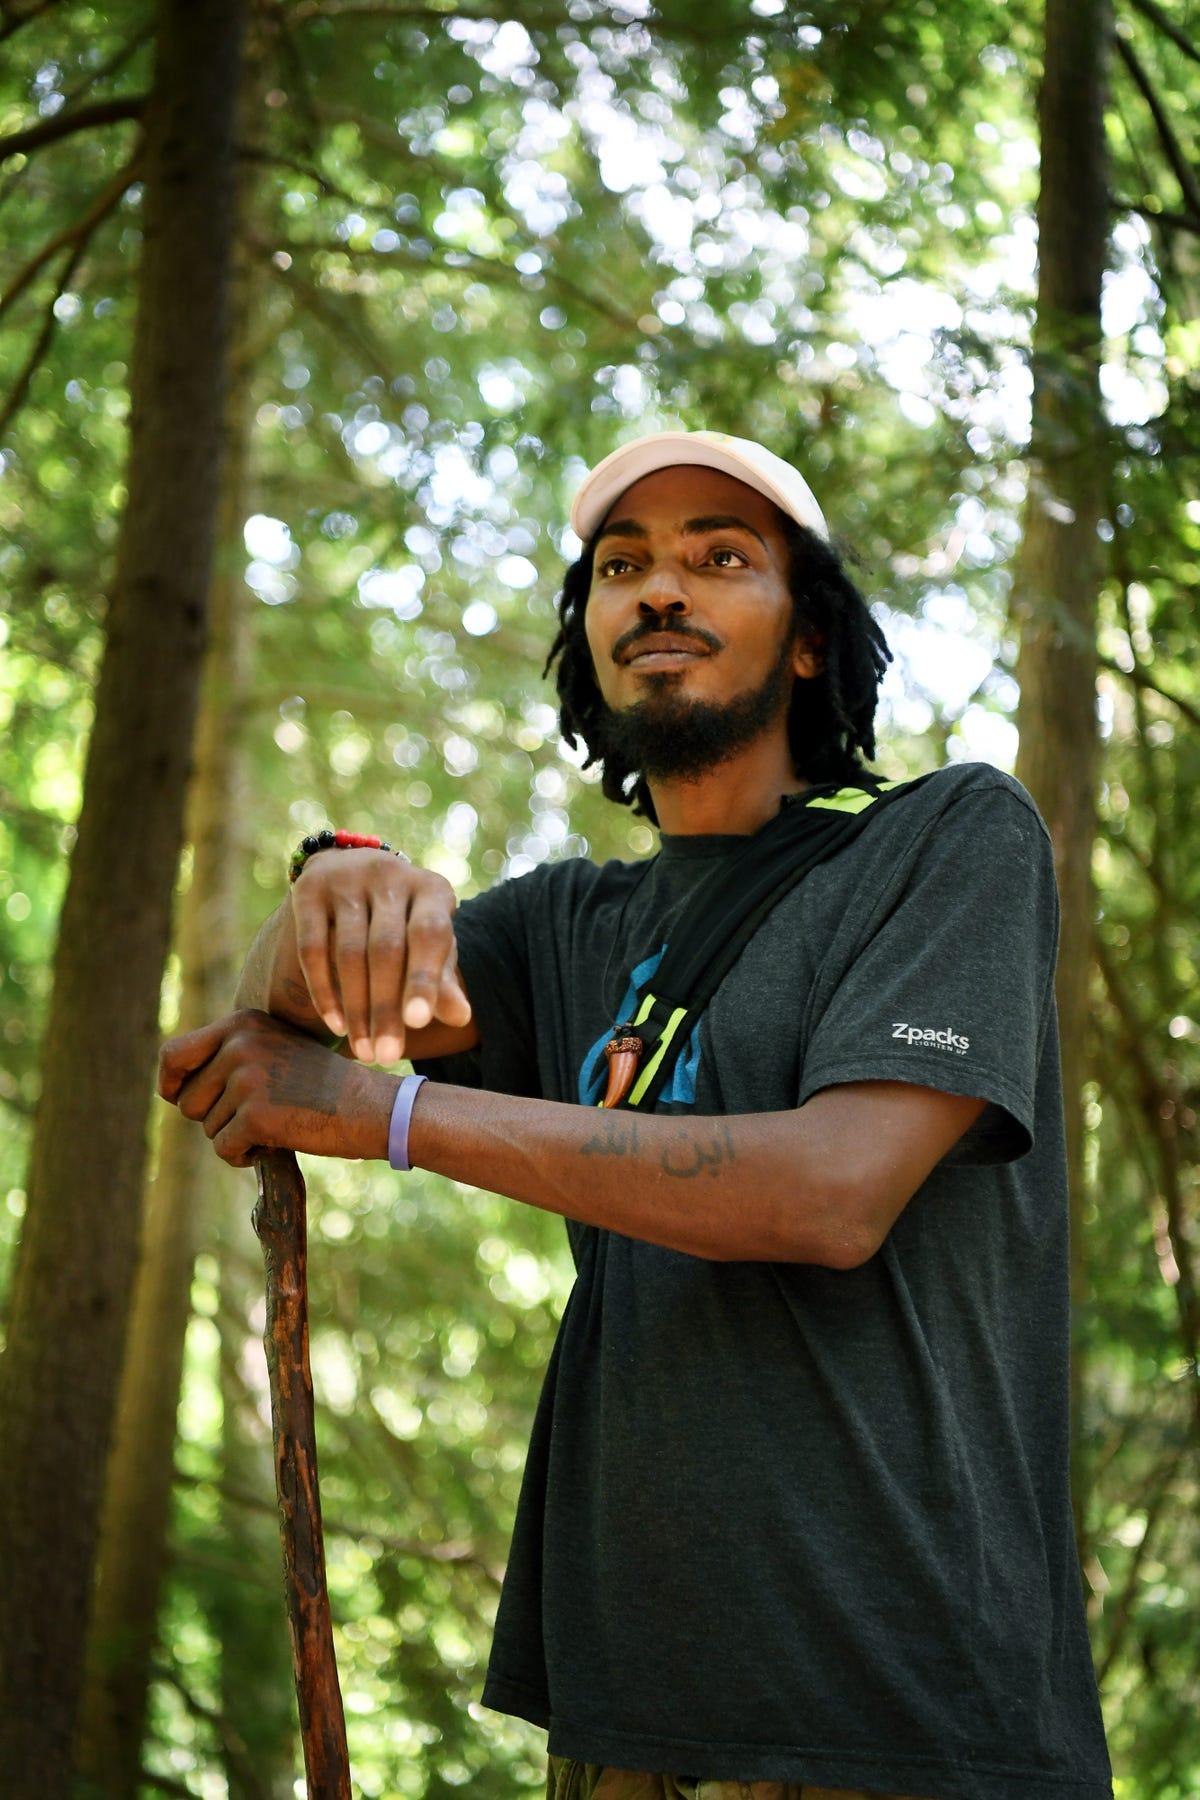 Appalachian Trail thru-hiker the Blackalachian returns home to Asheville